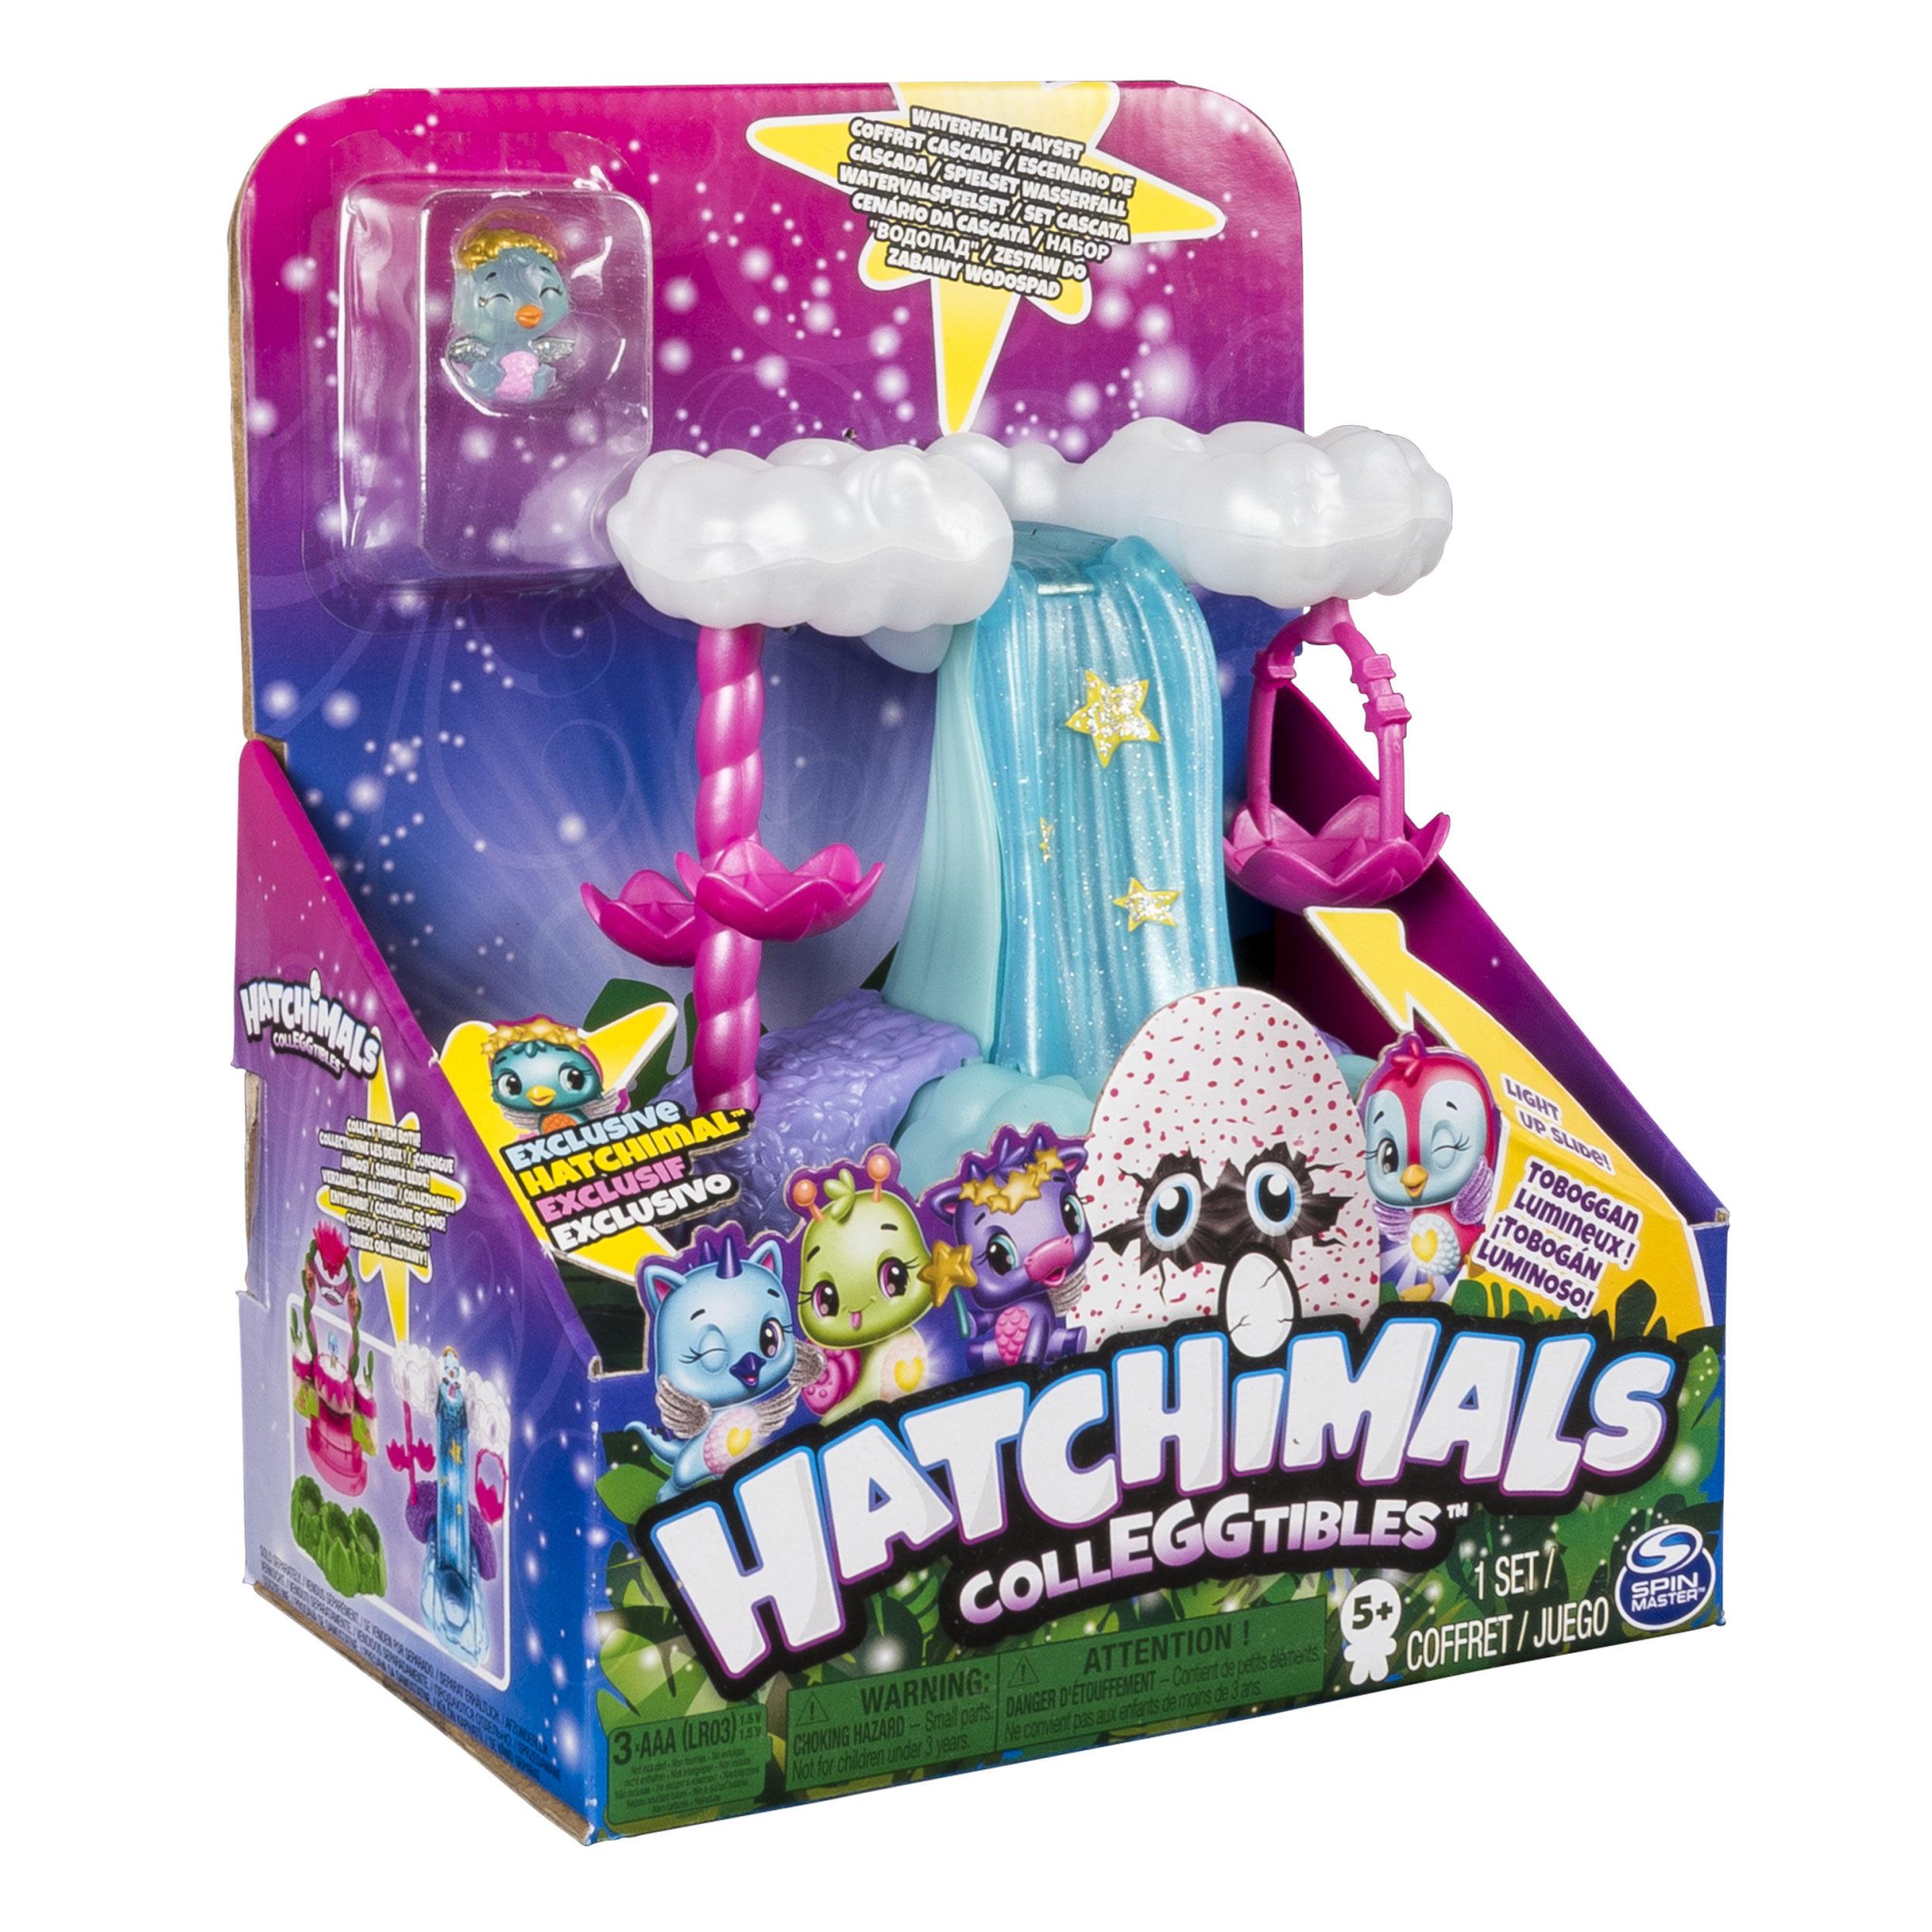 Hatchimals. Starlight Pool Colleggtibles Star Waterfall PlayseT